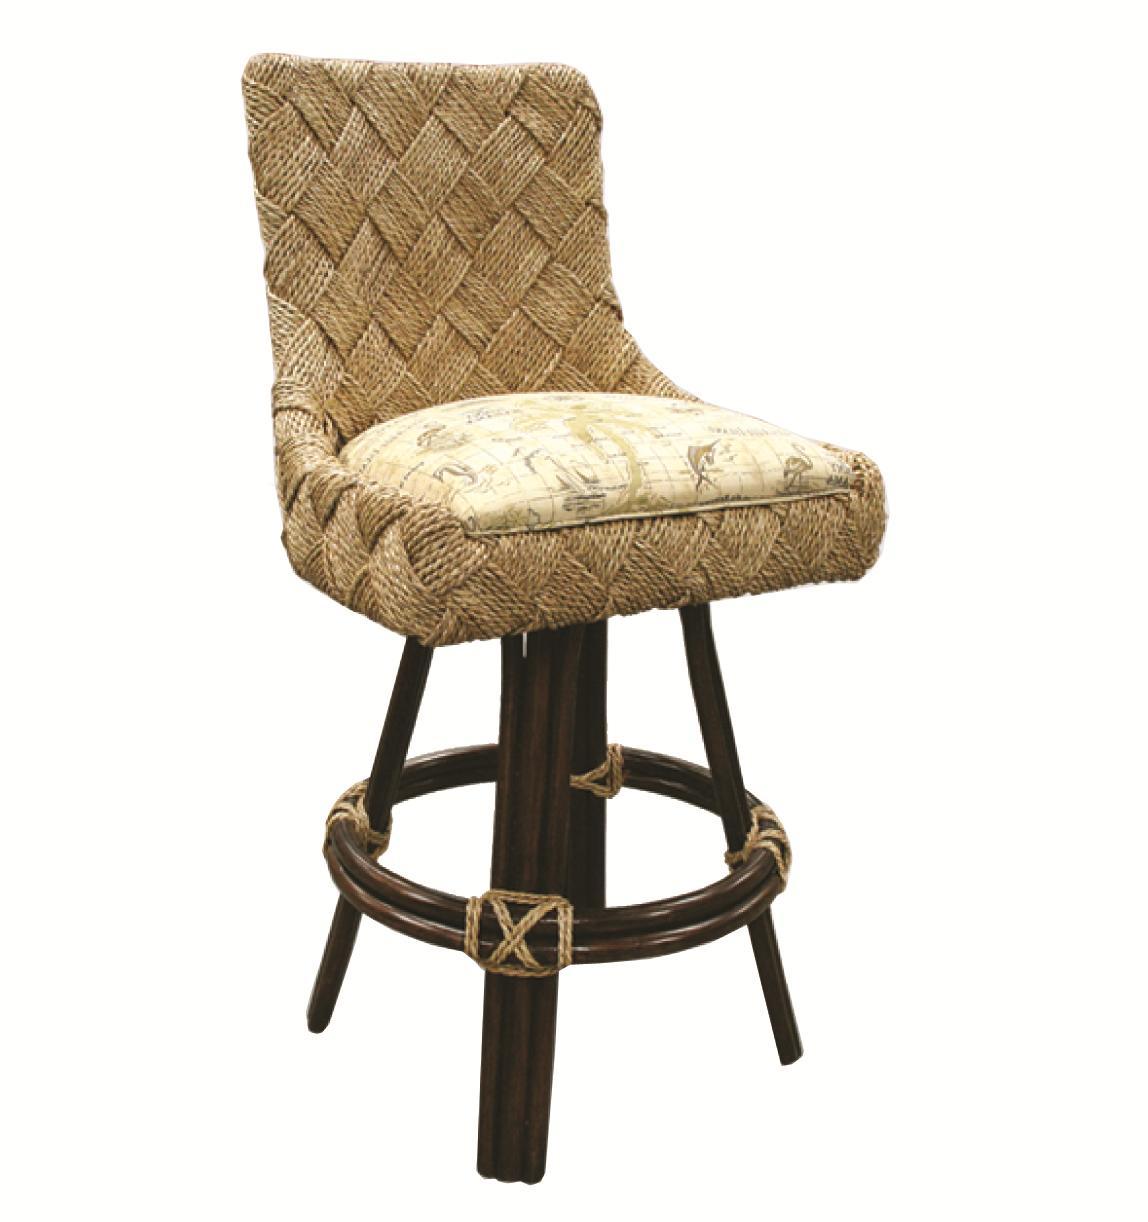 Capris Furniture Barstools Woven Back Bar Stool   Hudsonu0027s Furniture   Bar  Stool